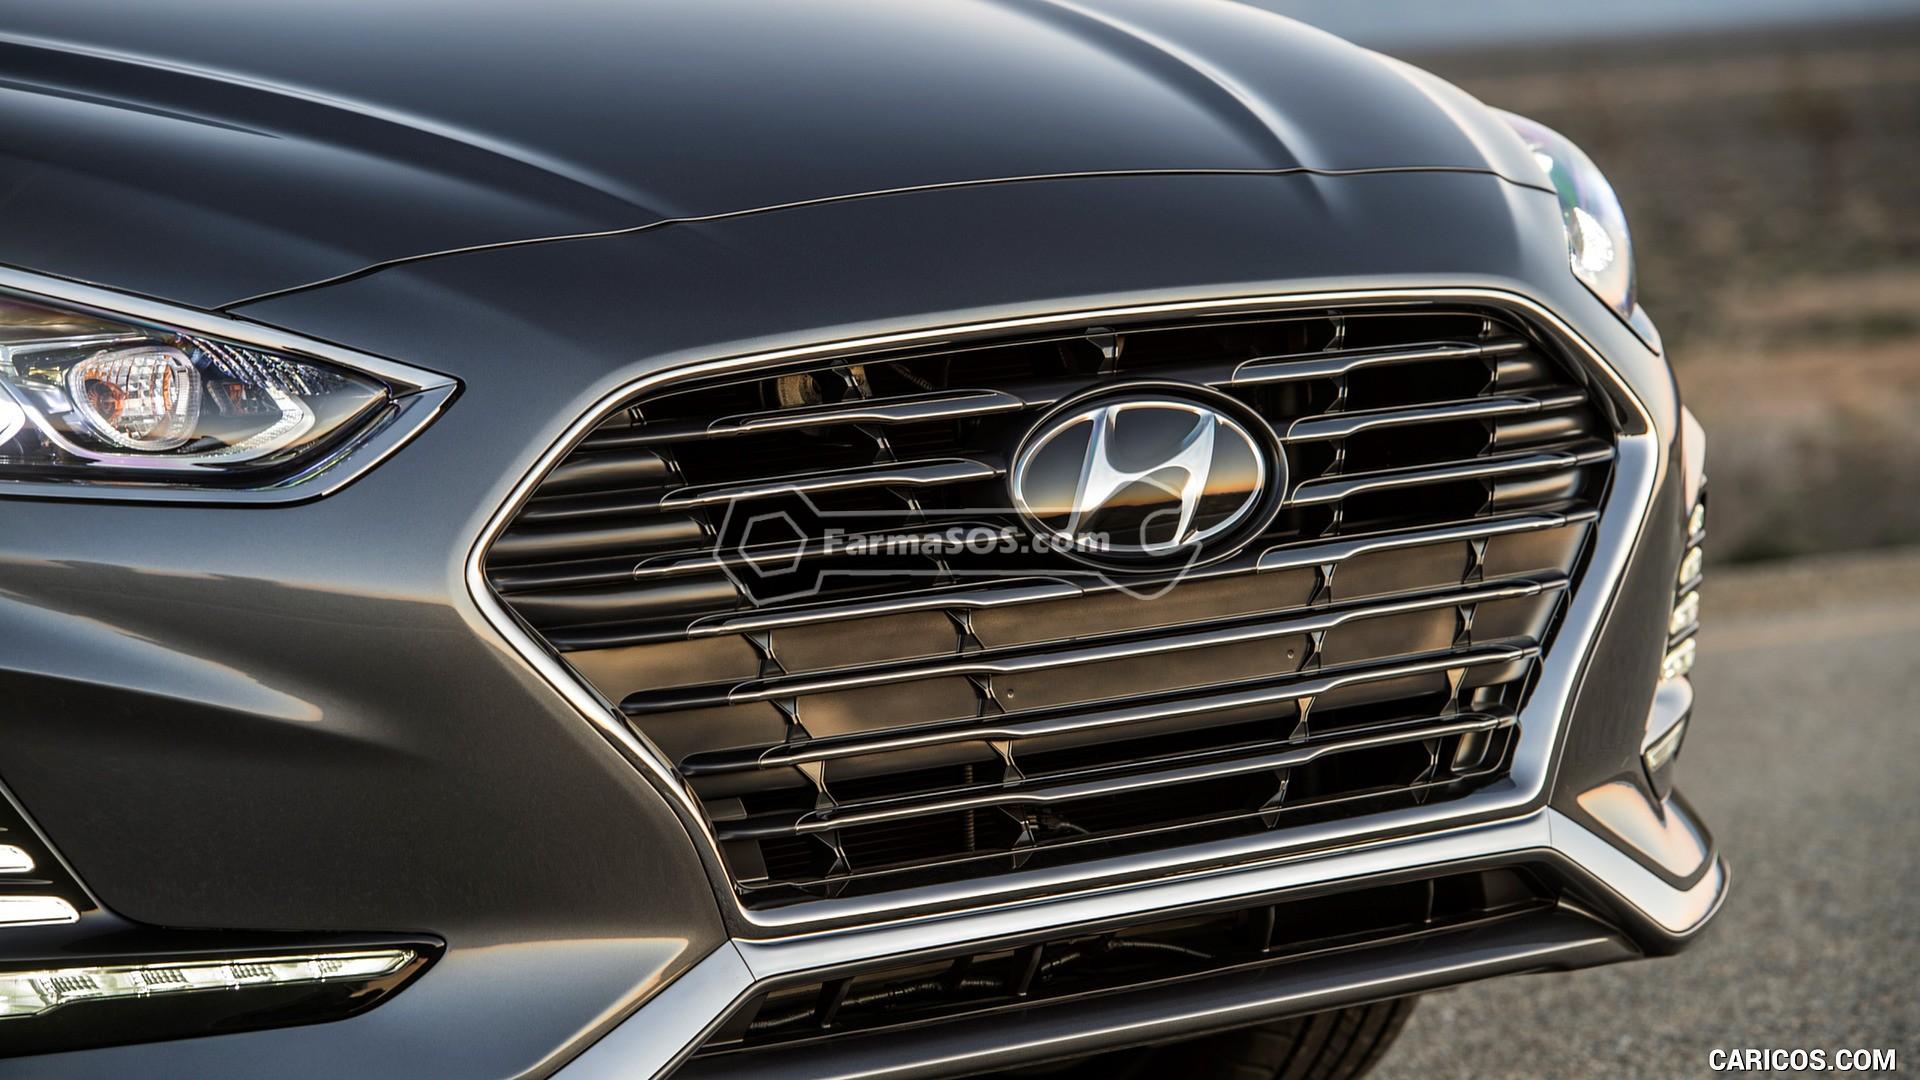 Hyundai Sonata 2018 2019 6 تصاویر هیوندای سوناتا مدل 2018 تا 2019